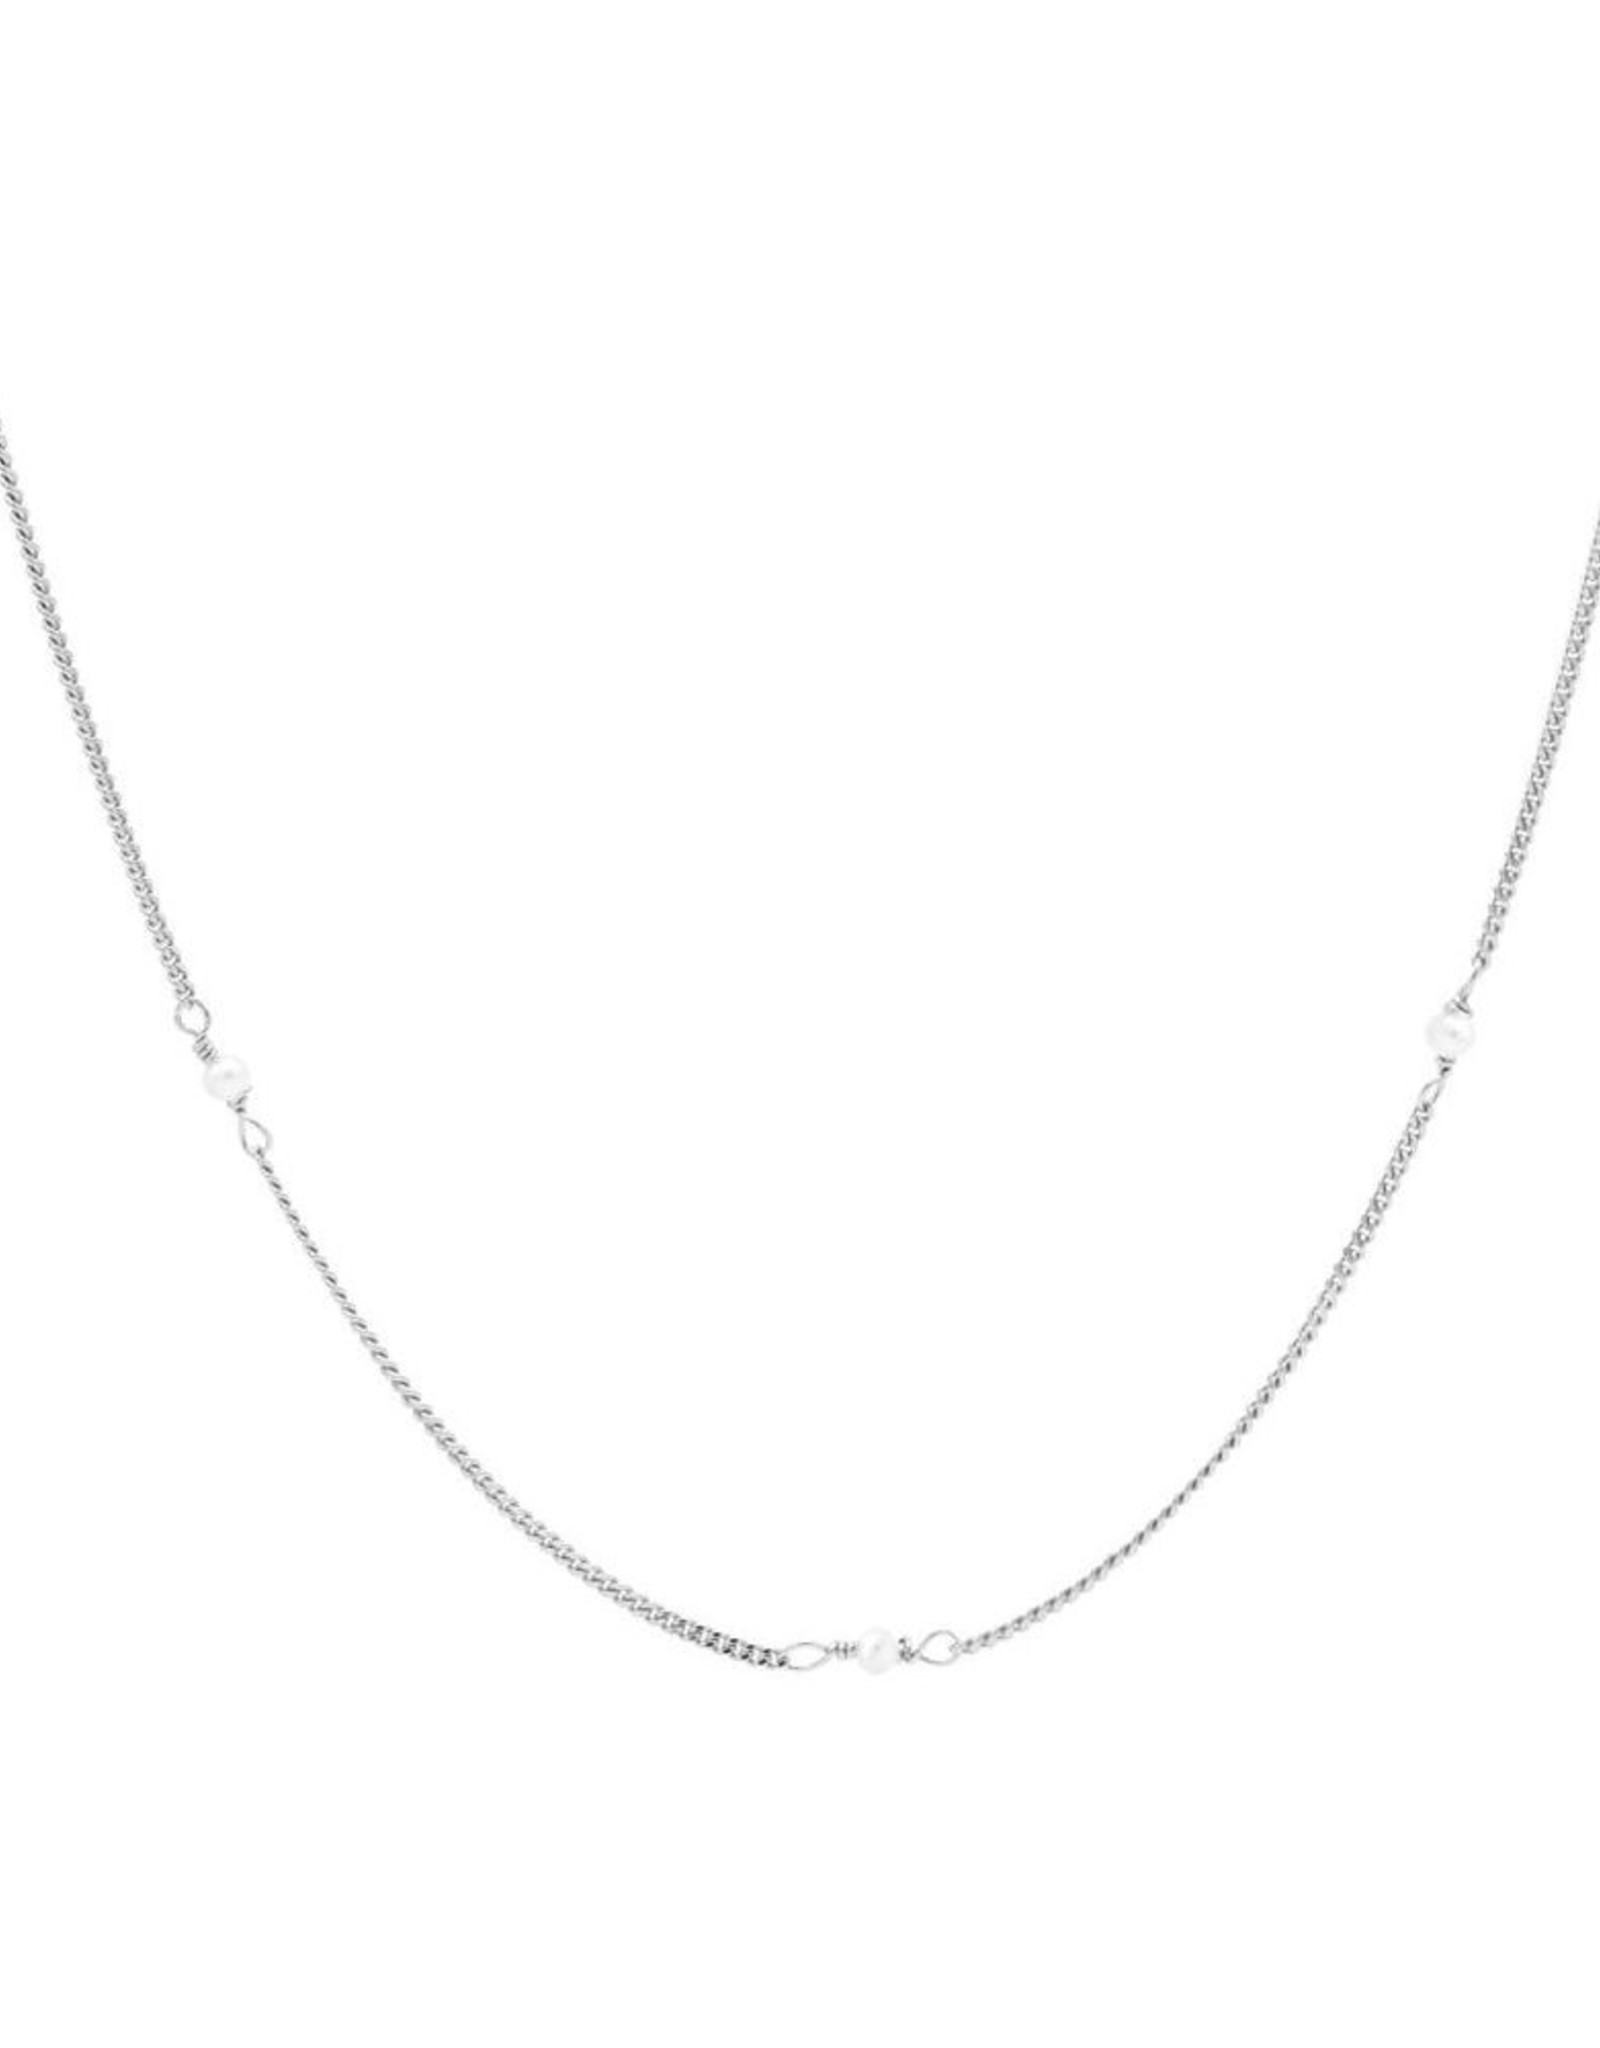 Karma Necklace Tiny Pearls Silver